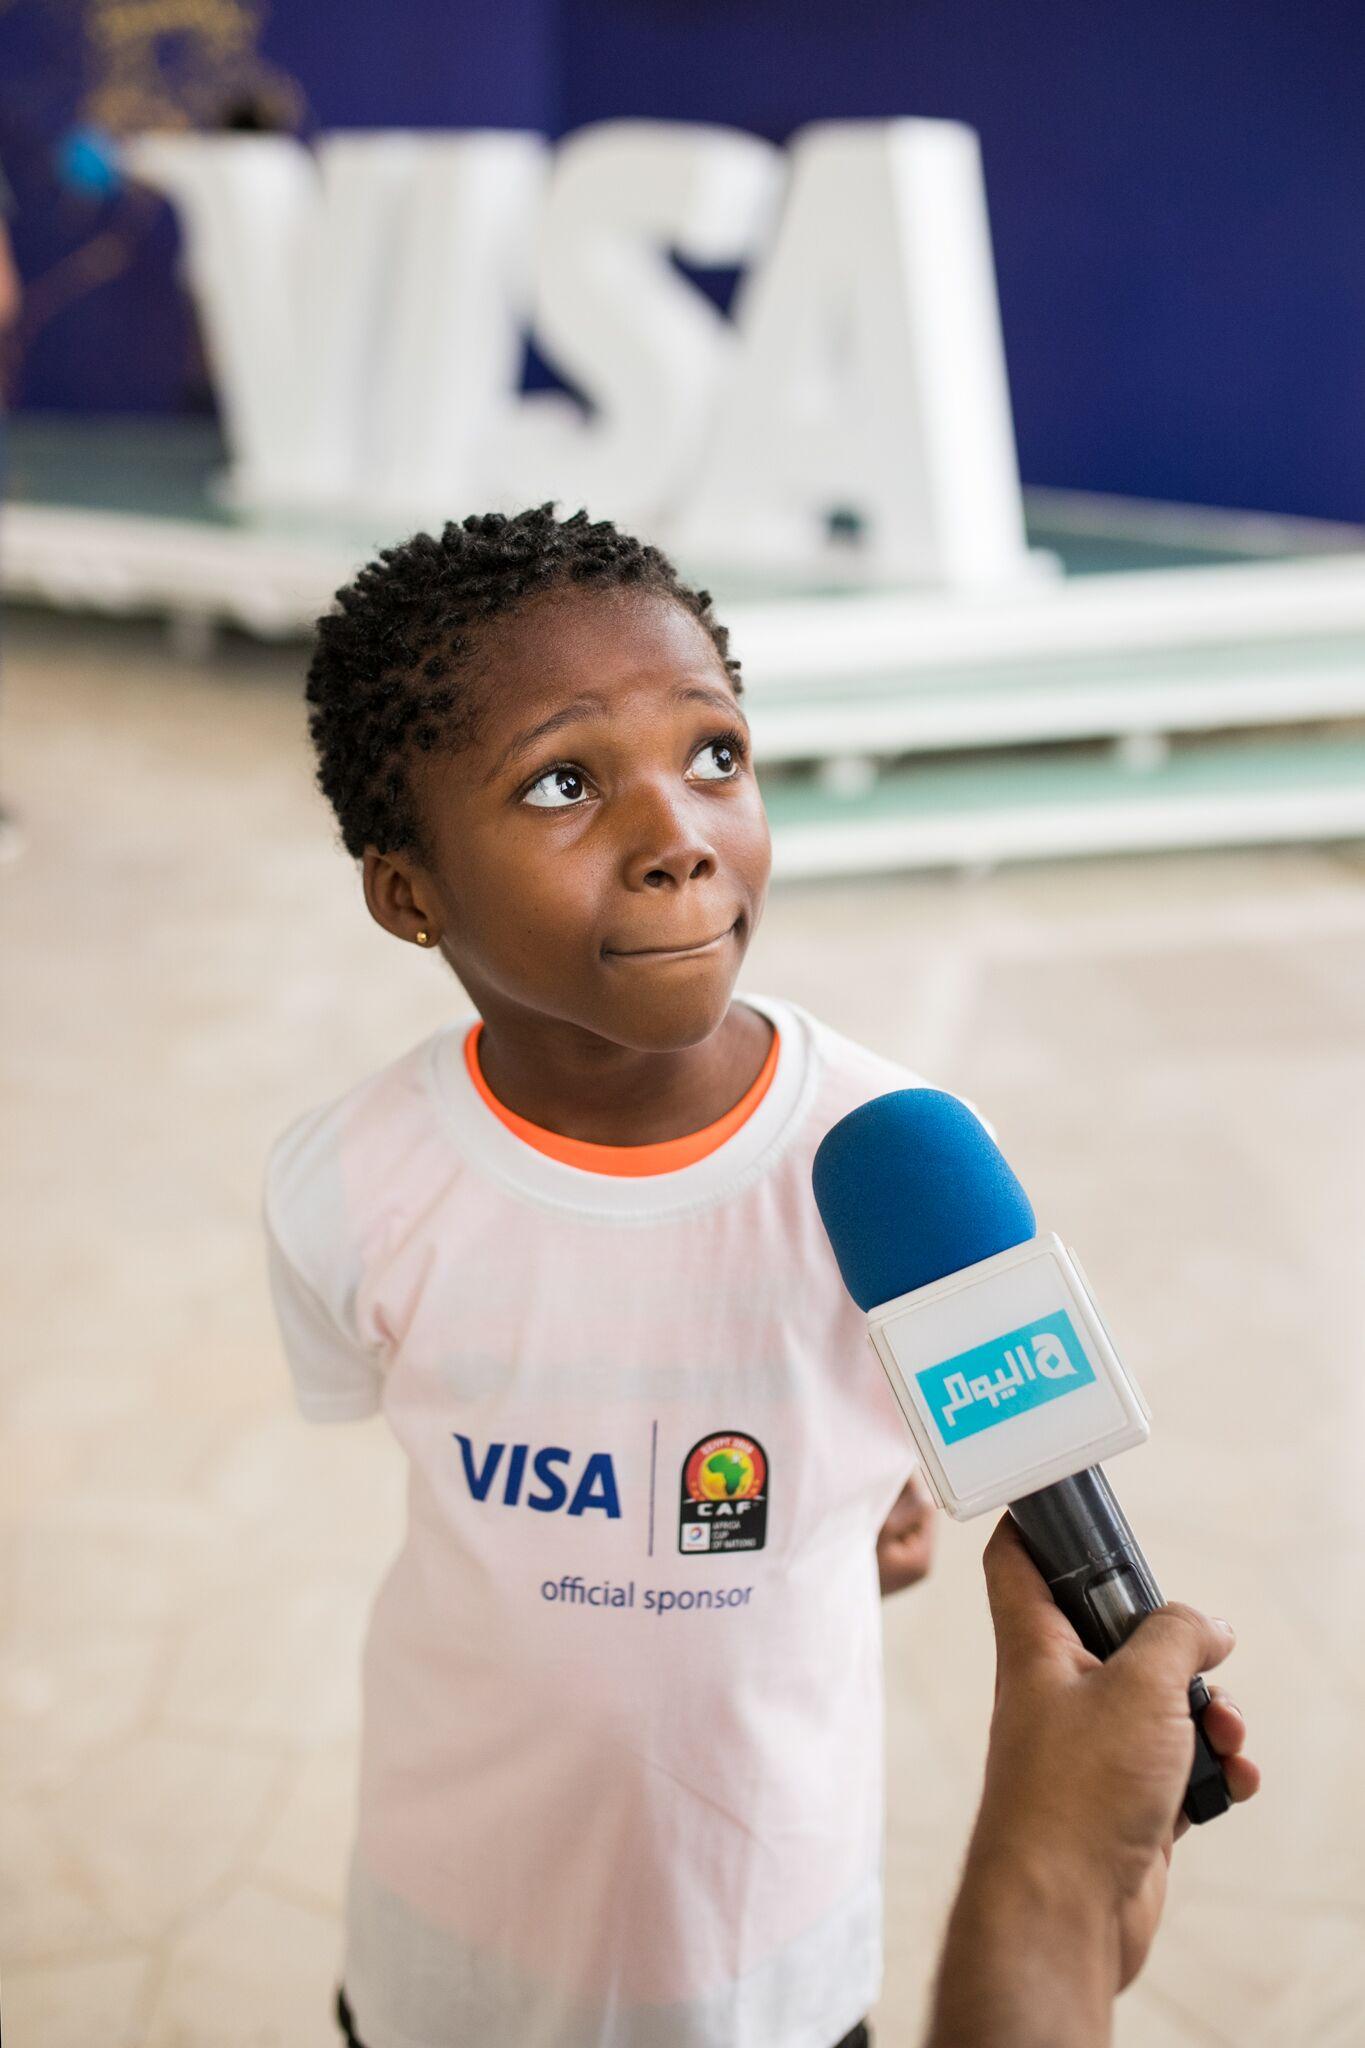 Visa Player Escort Programme makes dreams come true for Nigerian children (Photos)